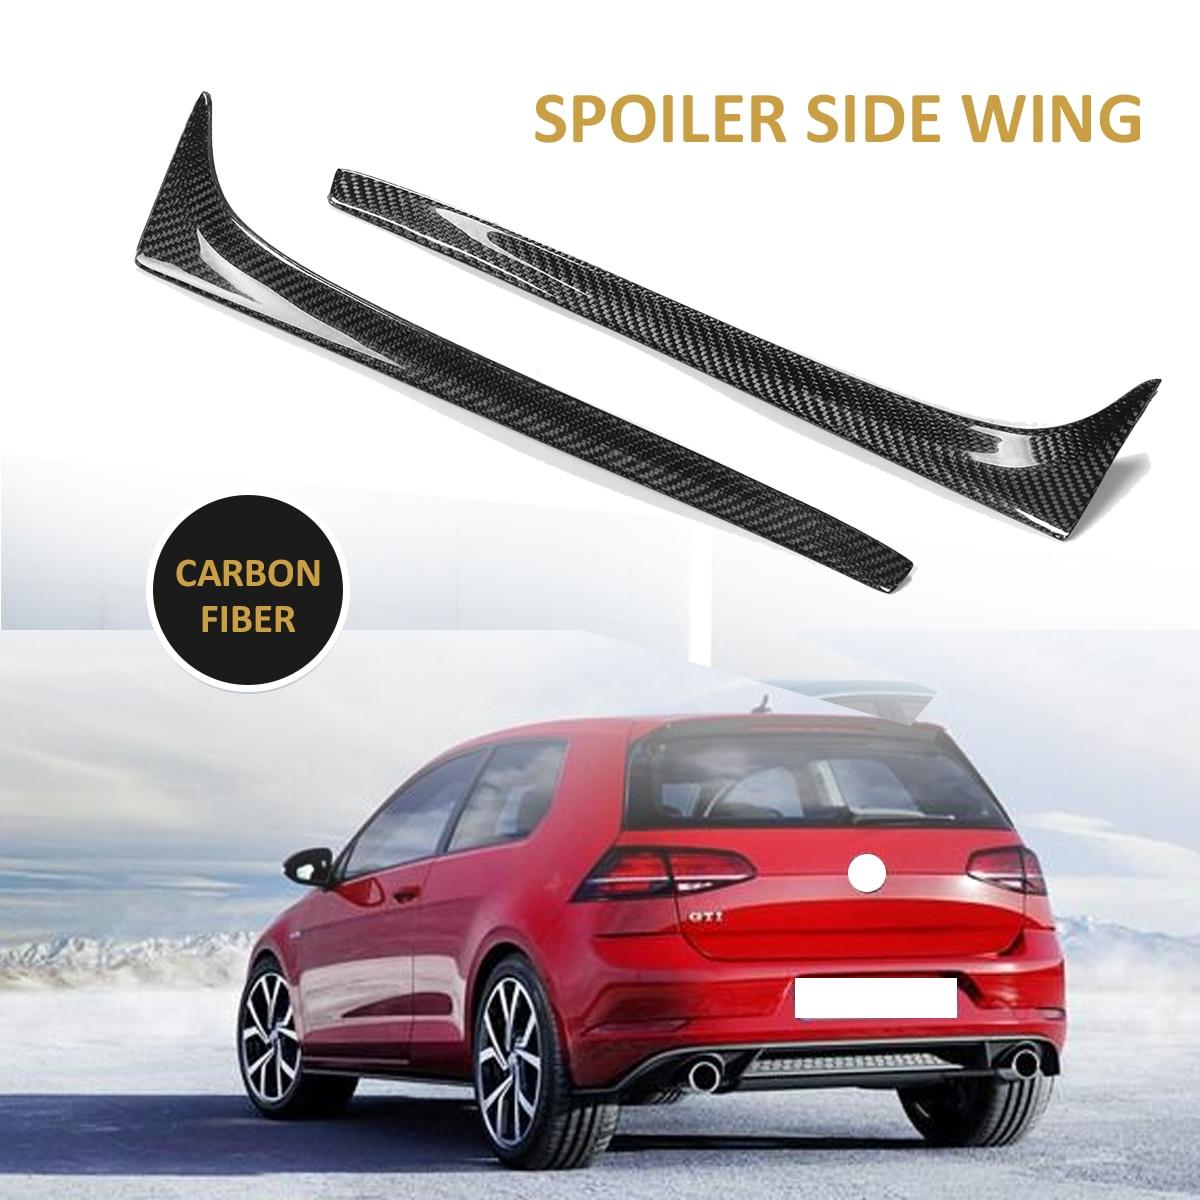 A Pair Real Carbon Fiber Rear Side Spoiler For Volkswagen GOLF Mk7 7 VII TSI TDI 2014-2017 Black Rear Tunk Side Wing Spoiler New seintex 84027 для audi a 3 2012 volkswagen golf vii